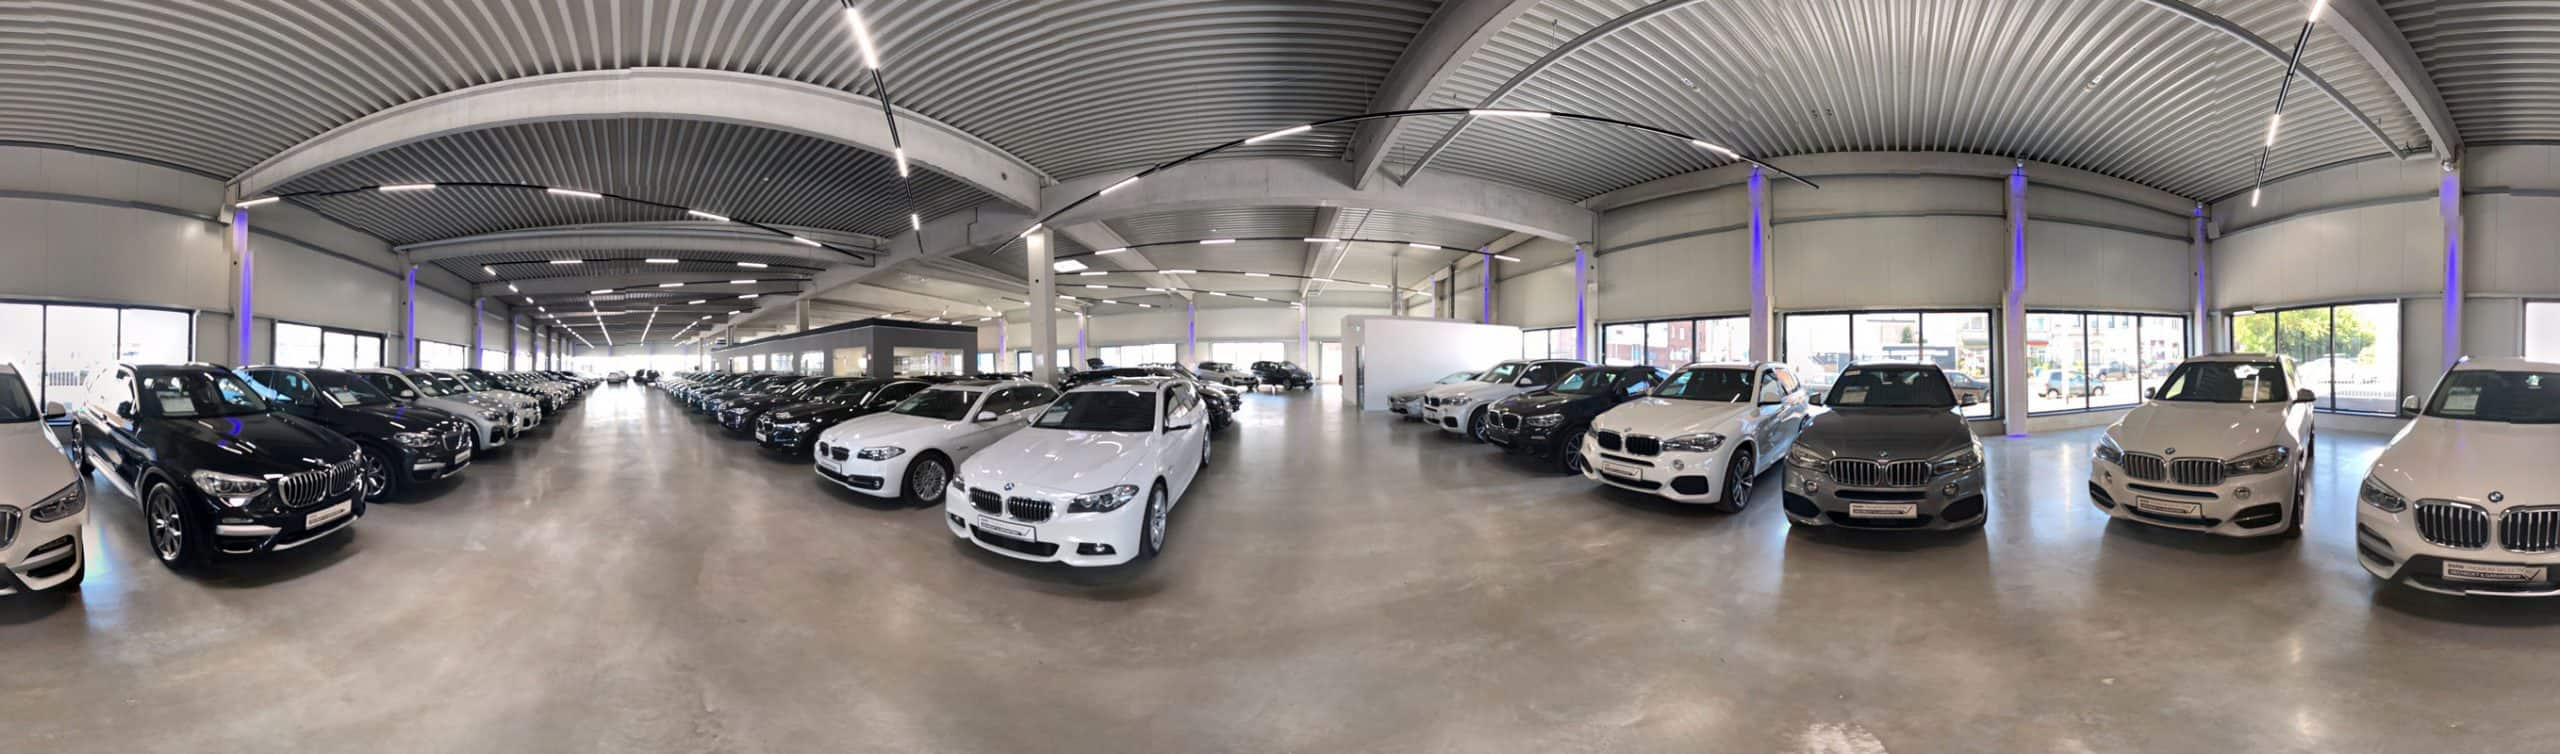 ABK BMW Panorama